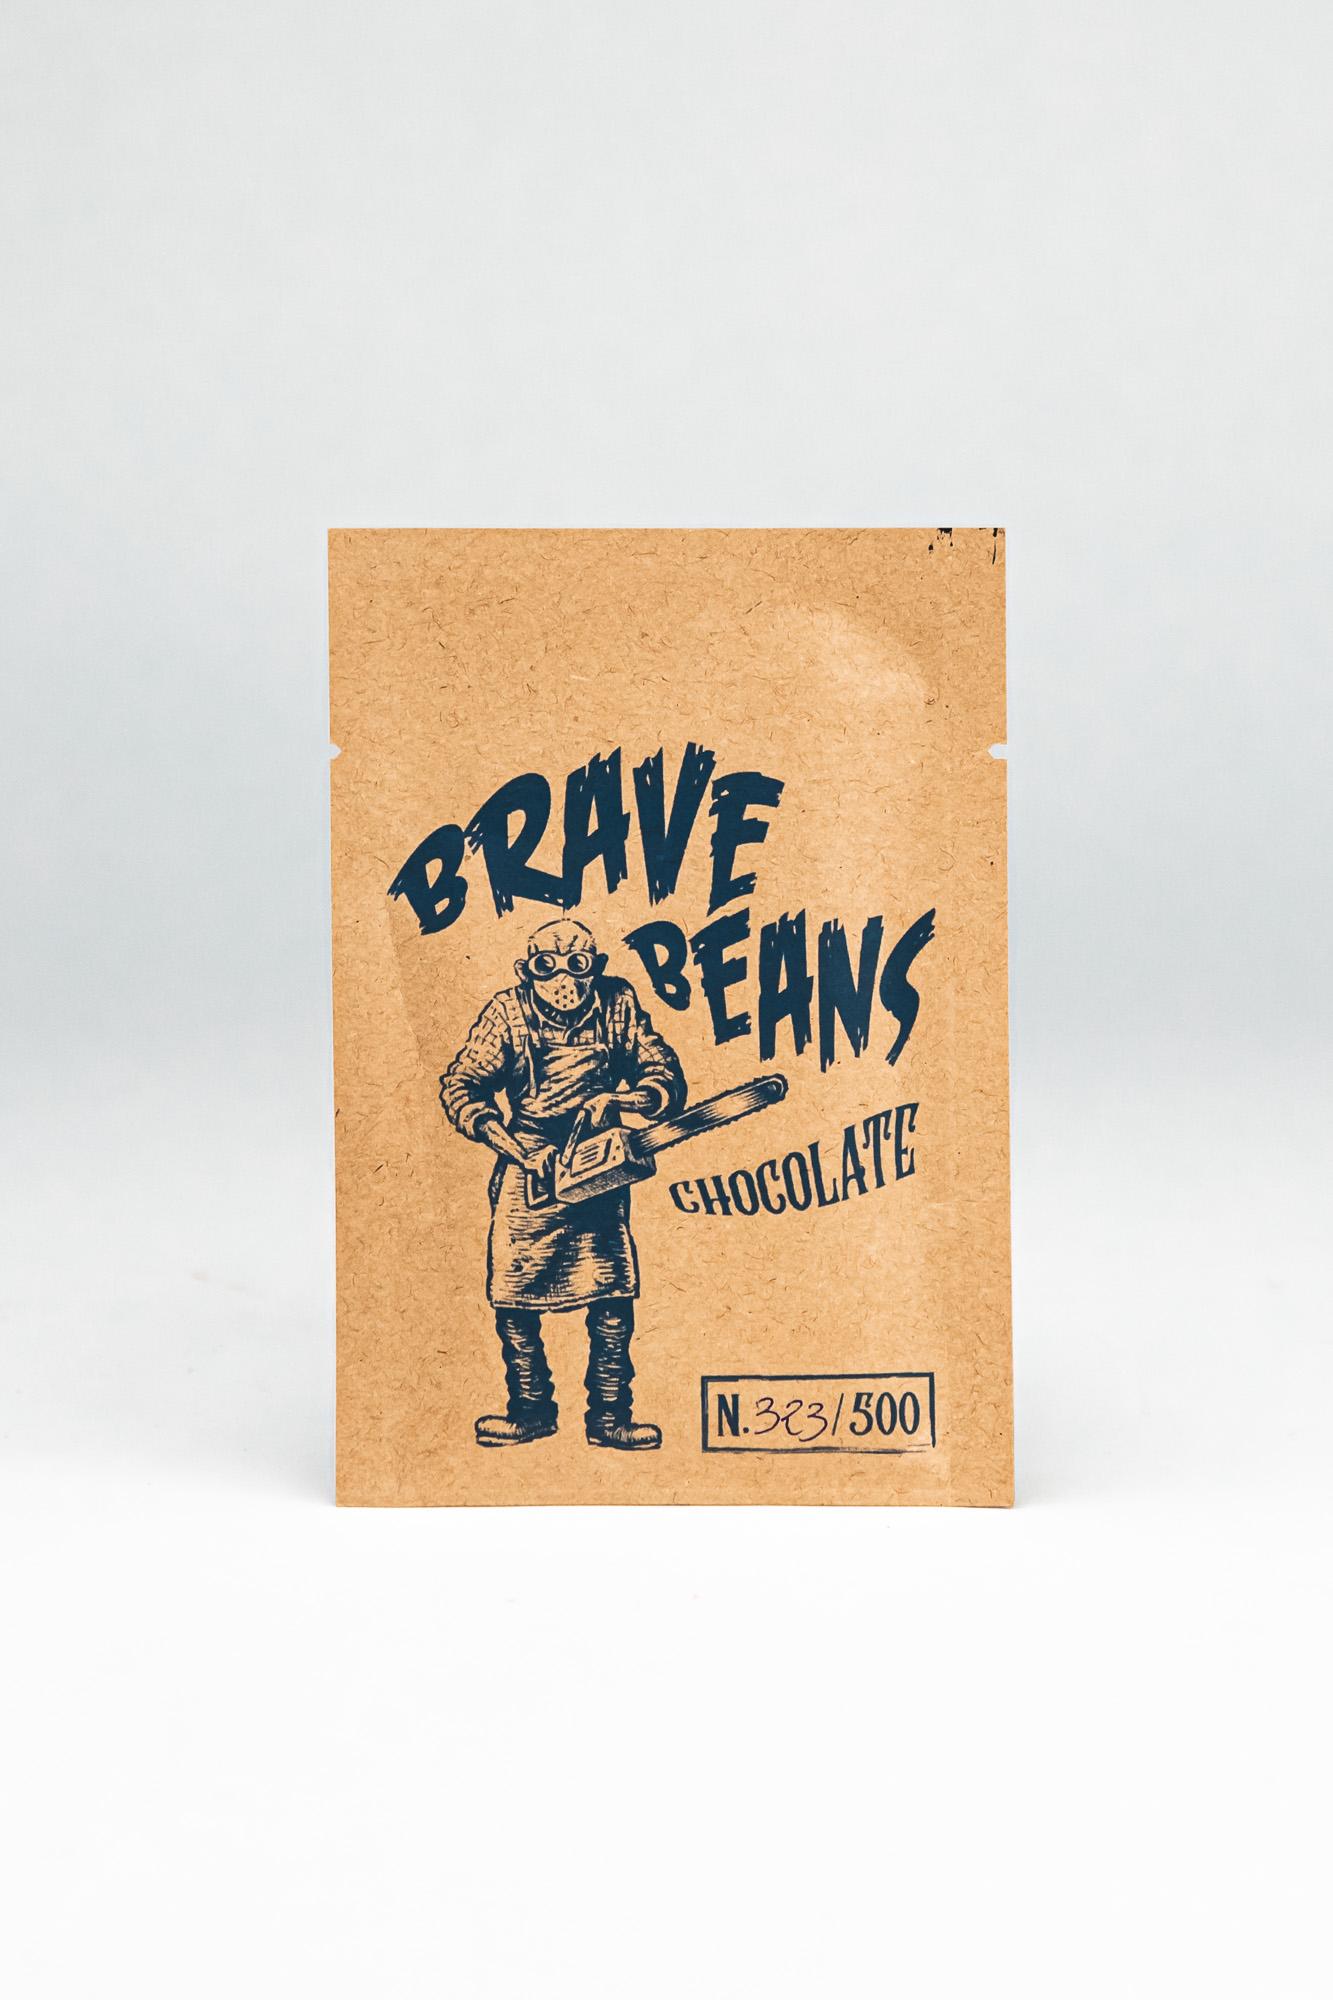 RATATATA' - Brave Beans Chocolate